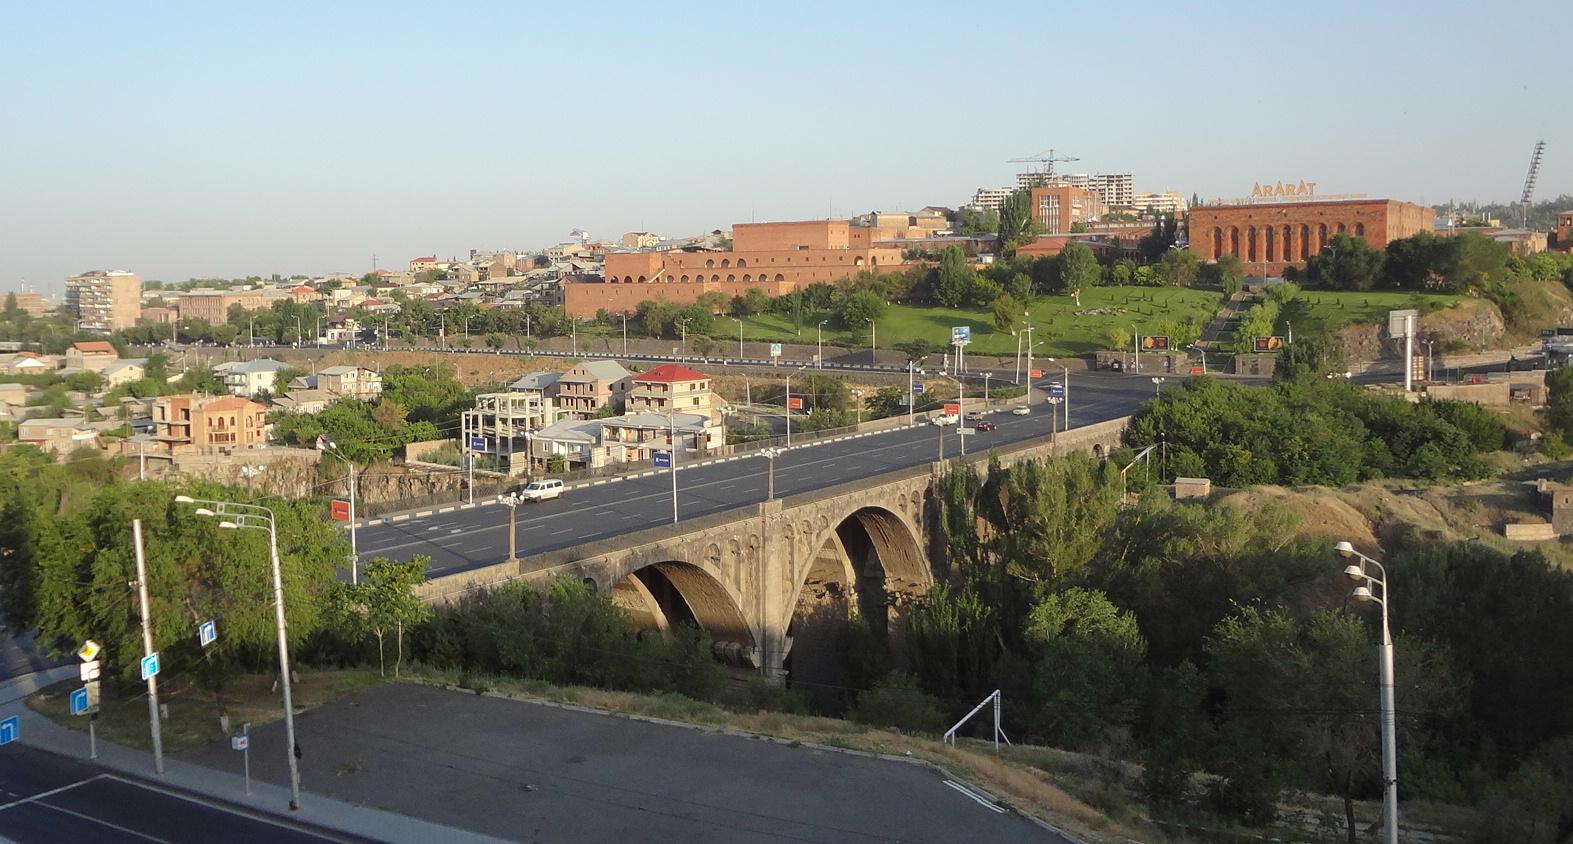 The Ararat Distillery | BRANDY | Pinterest